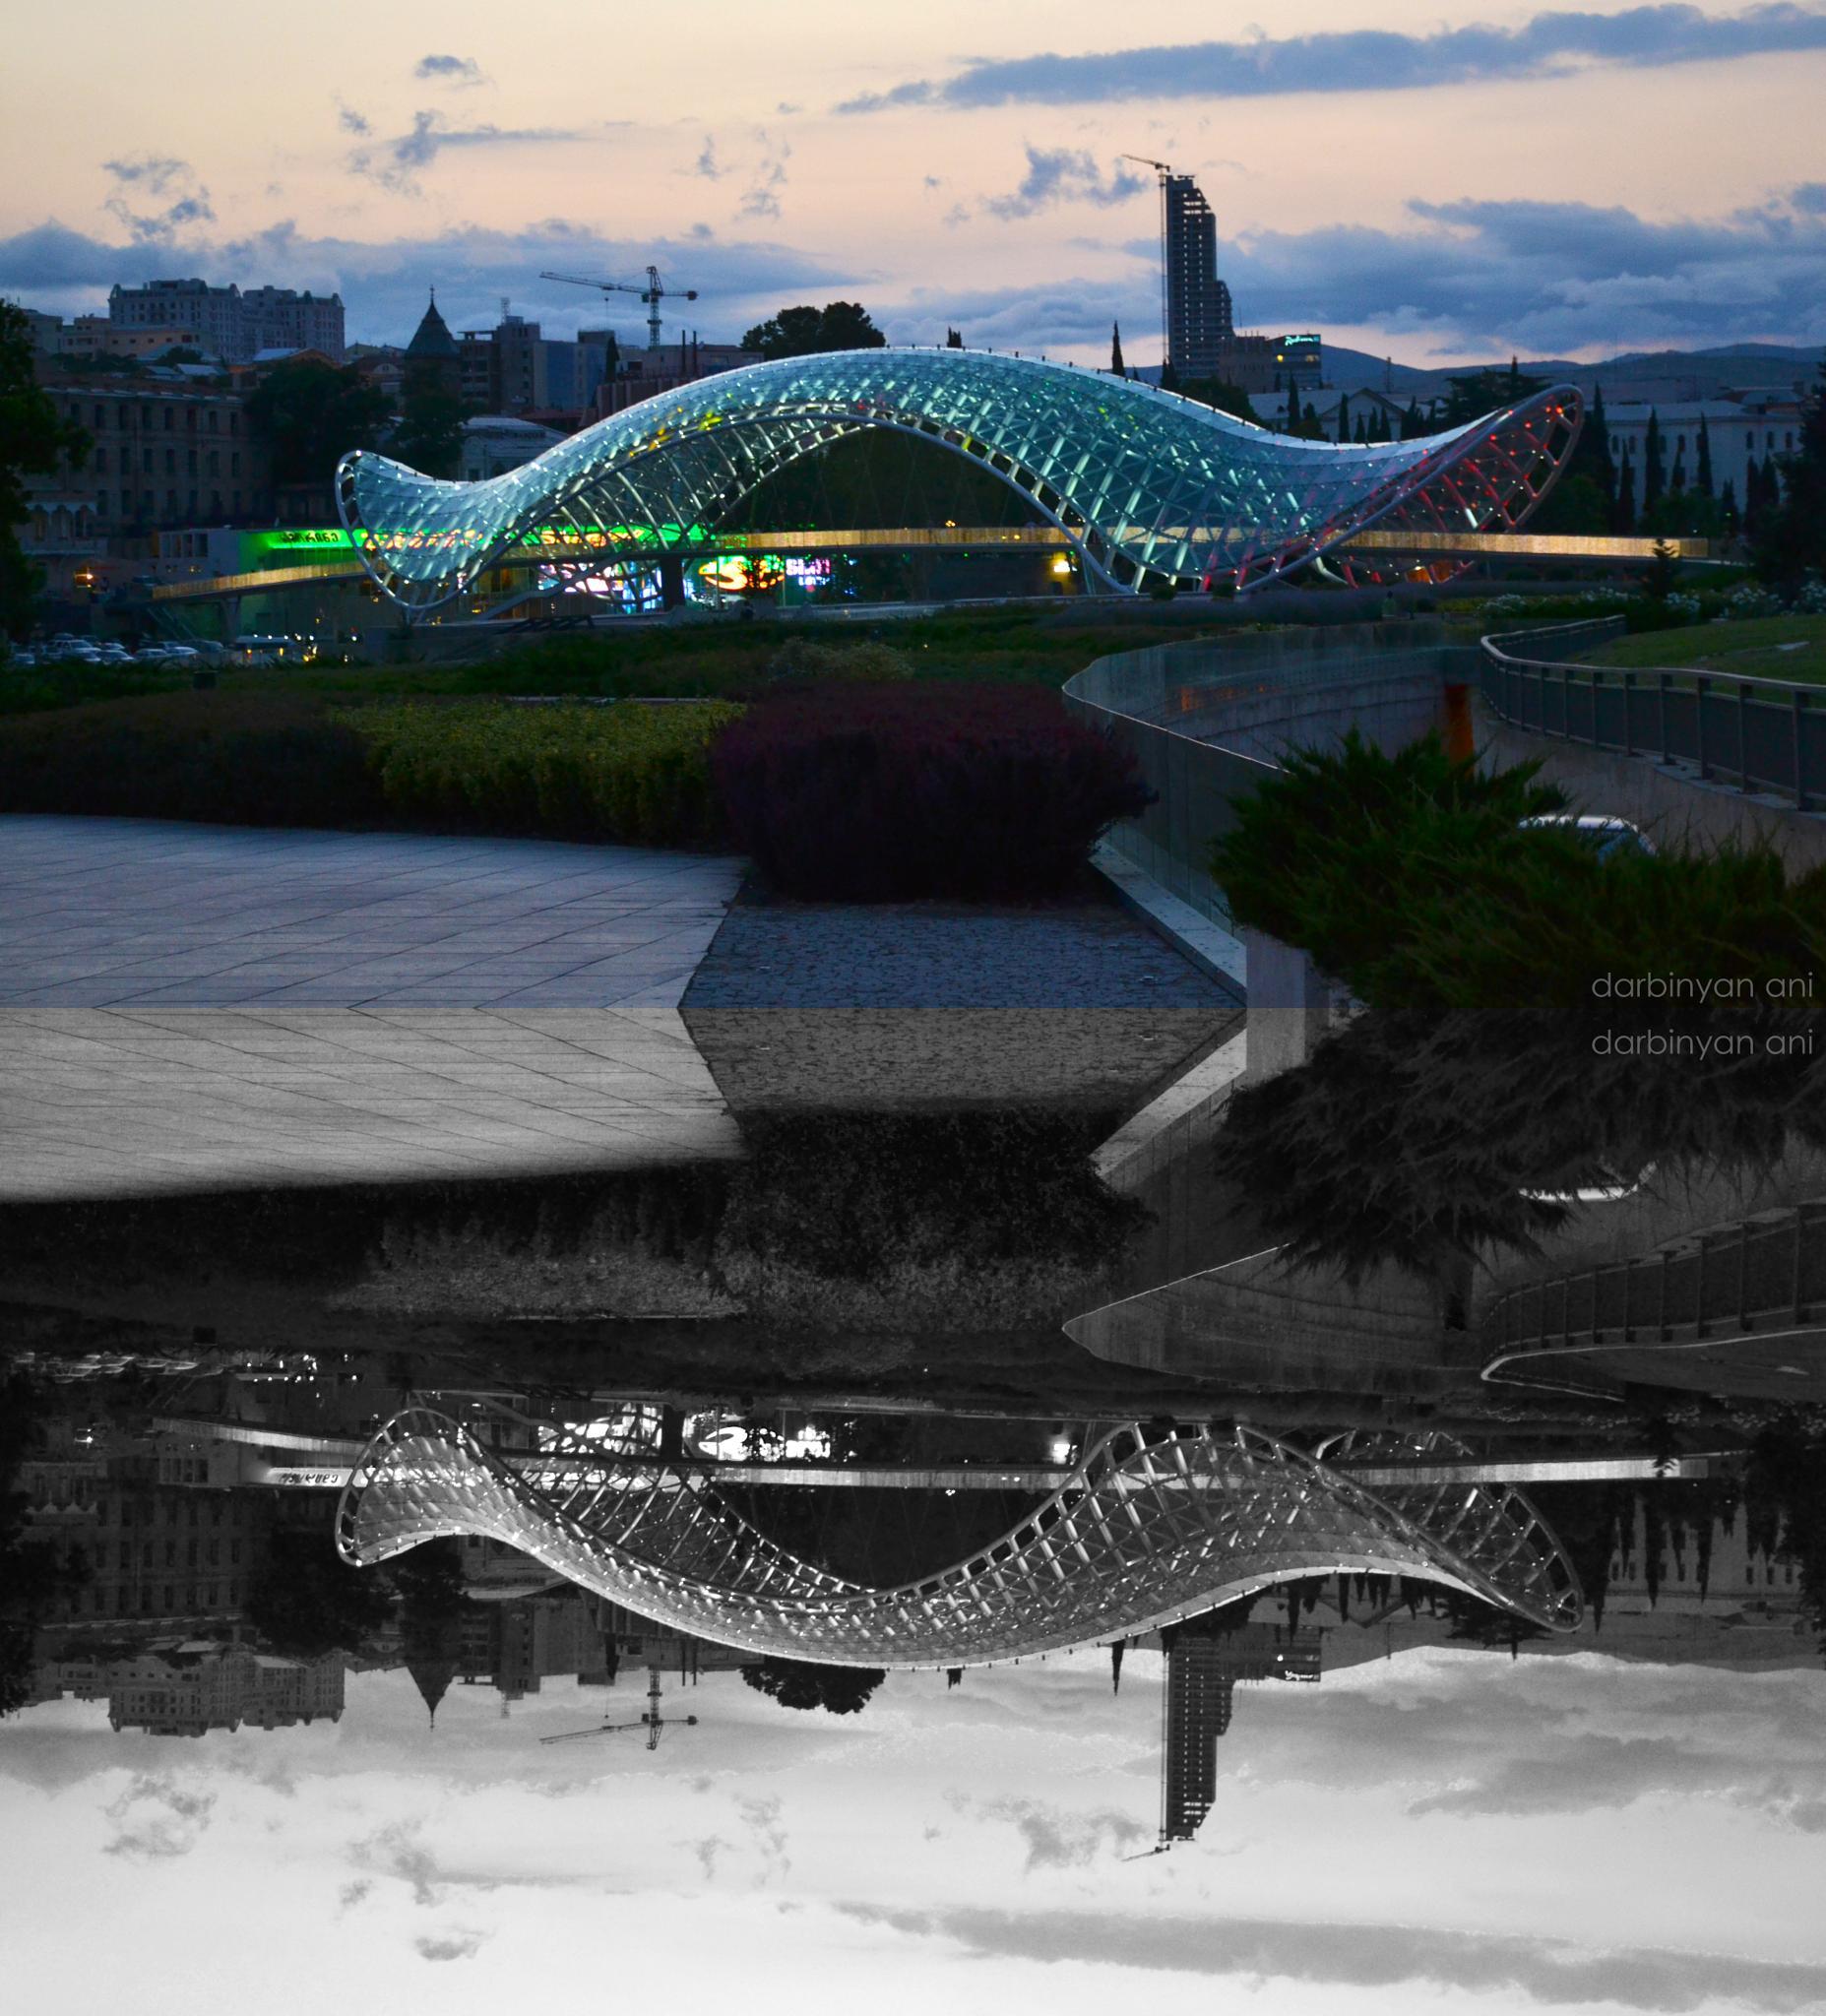 Tbilisi by ani darbinyan